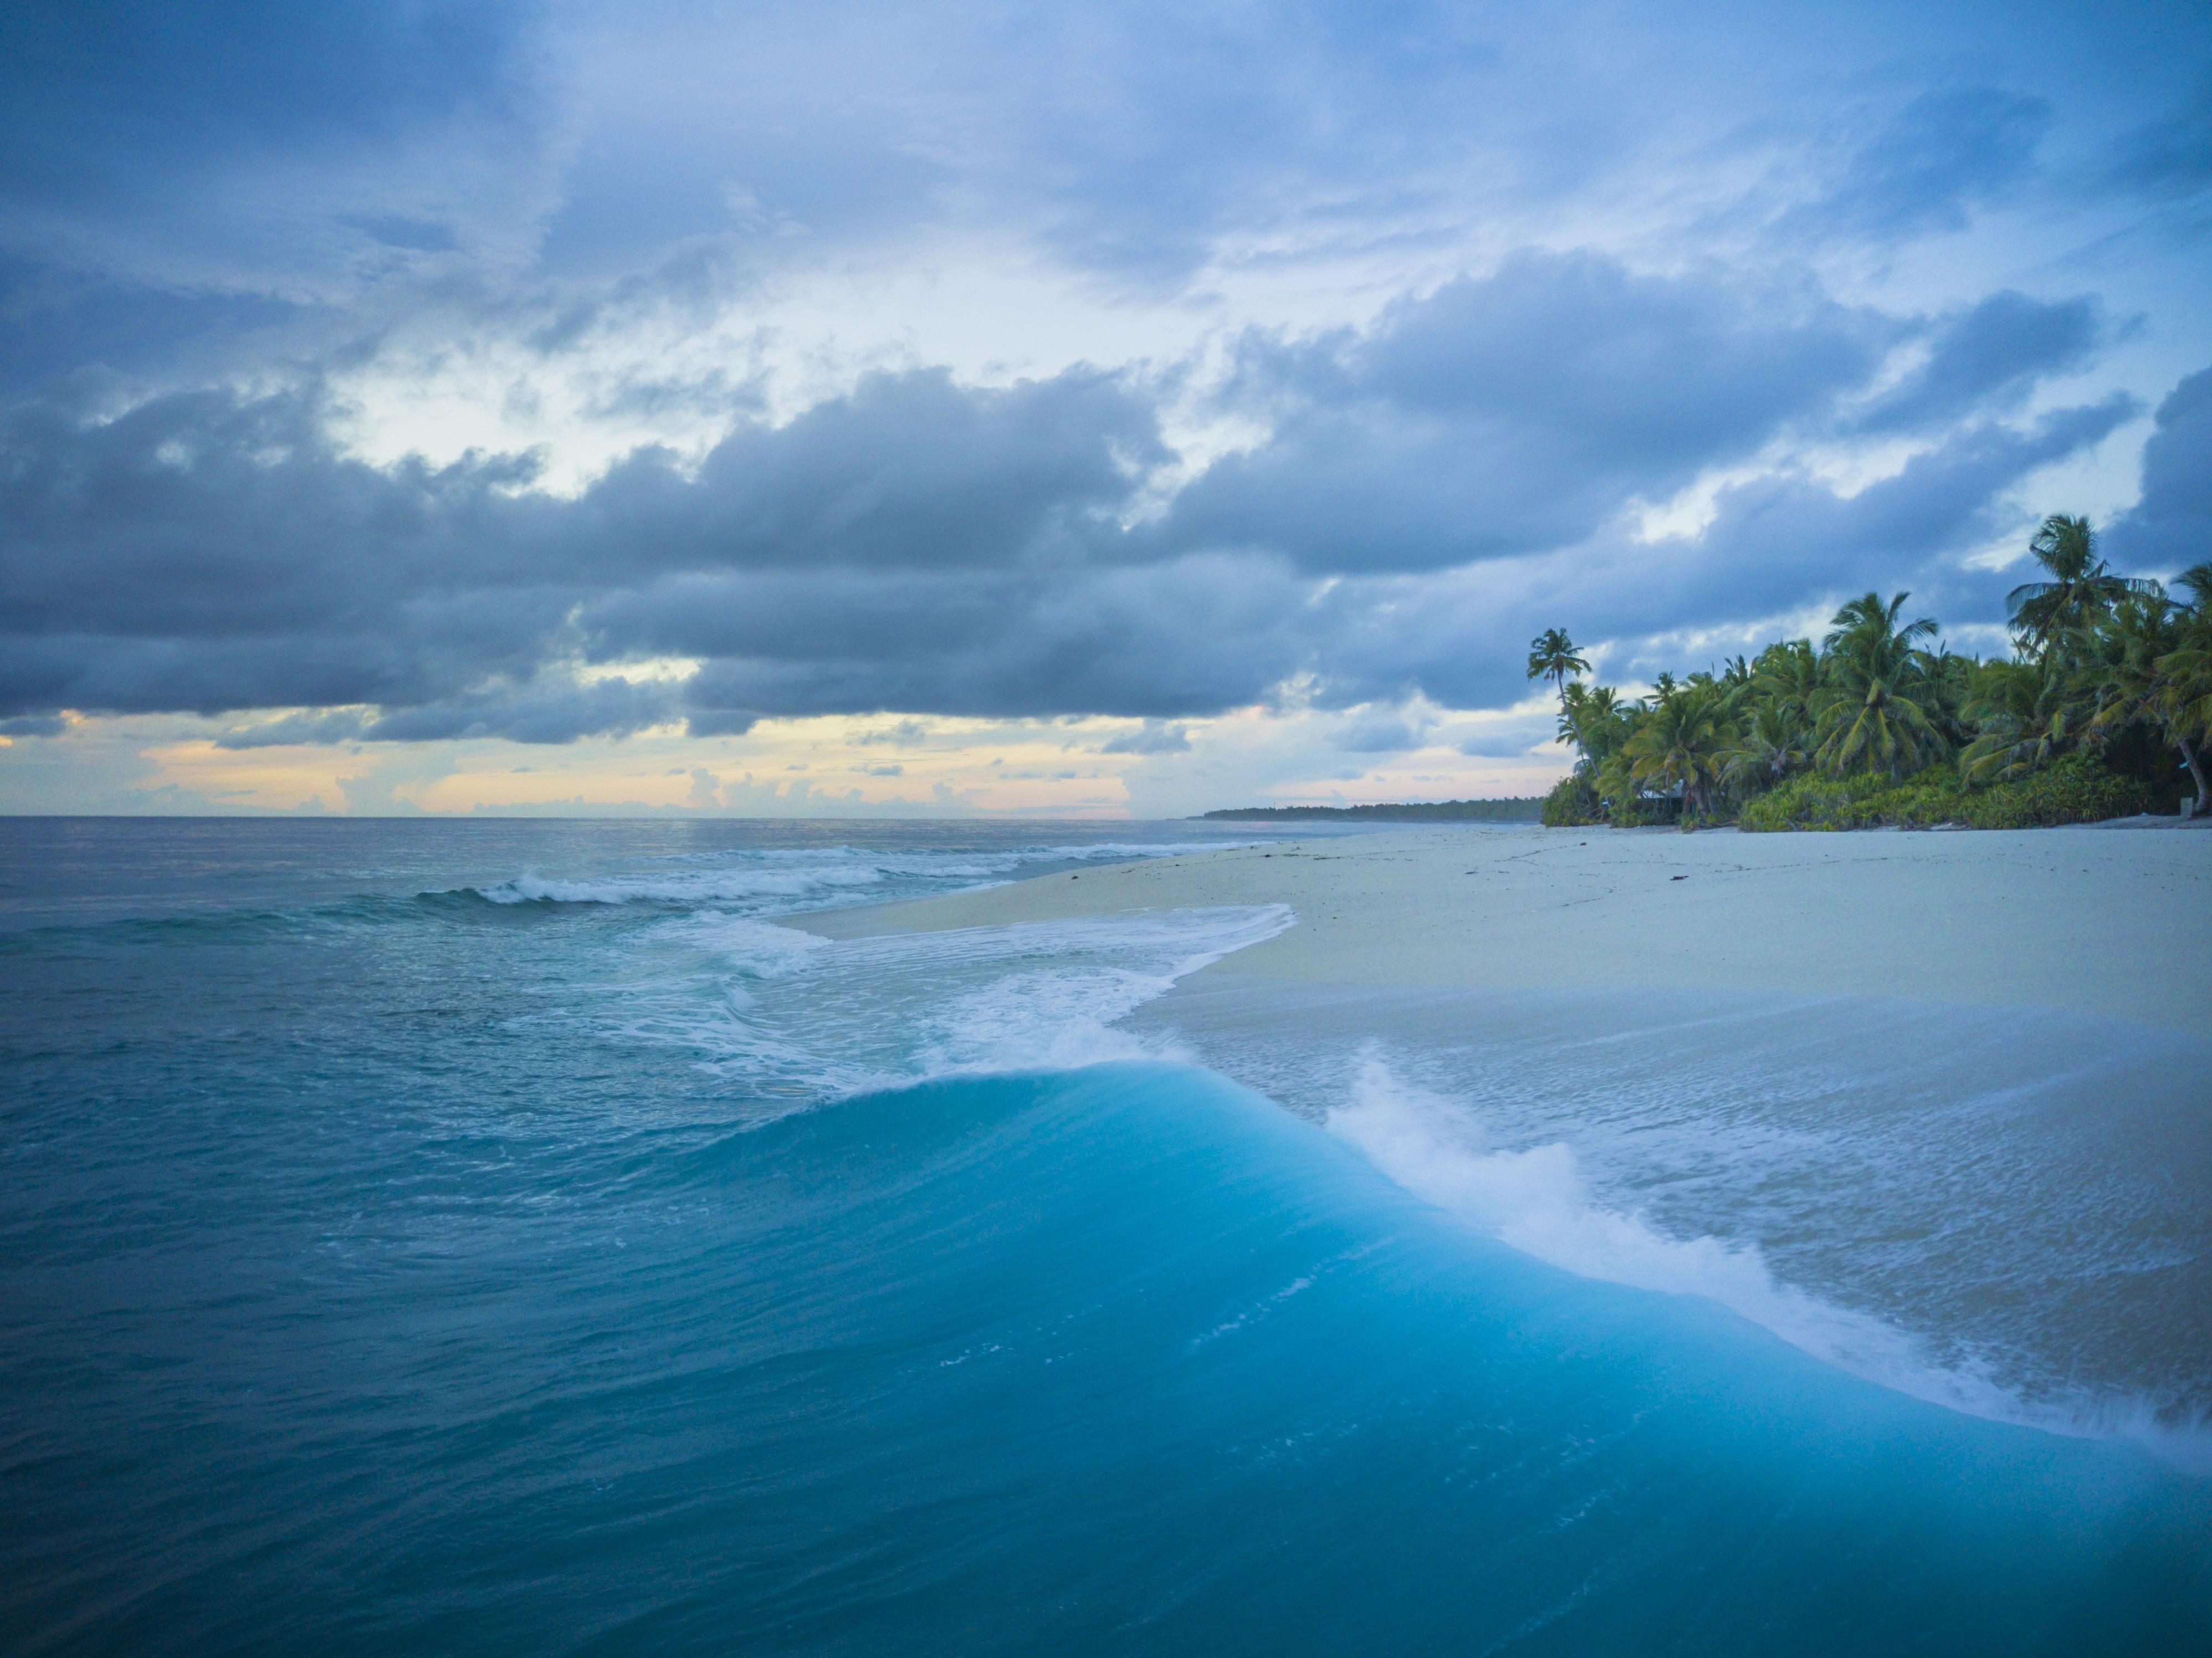 sea waves splashing on seashore during golden hour painting